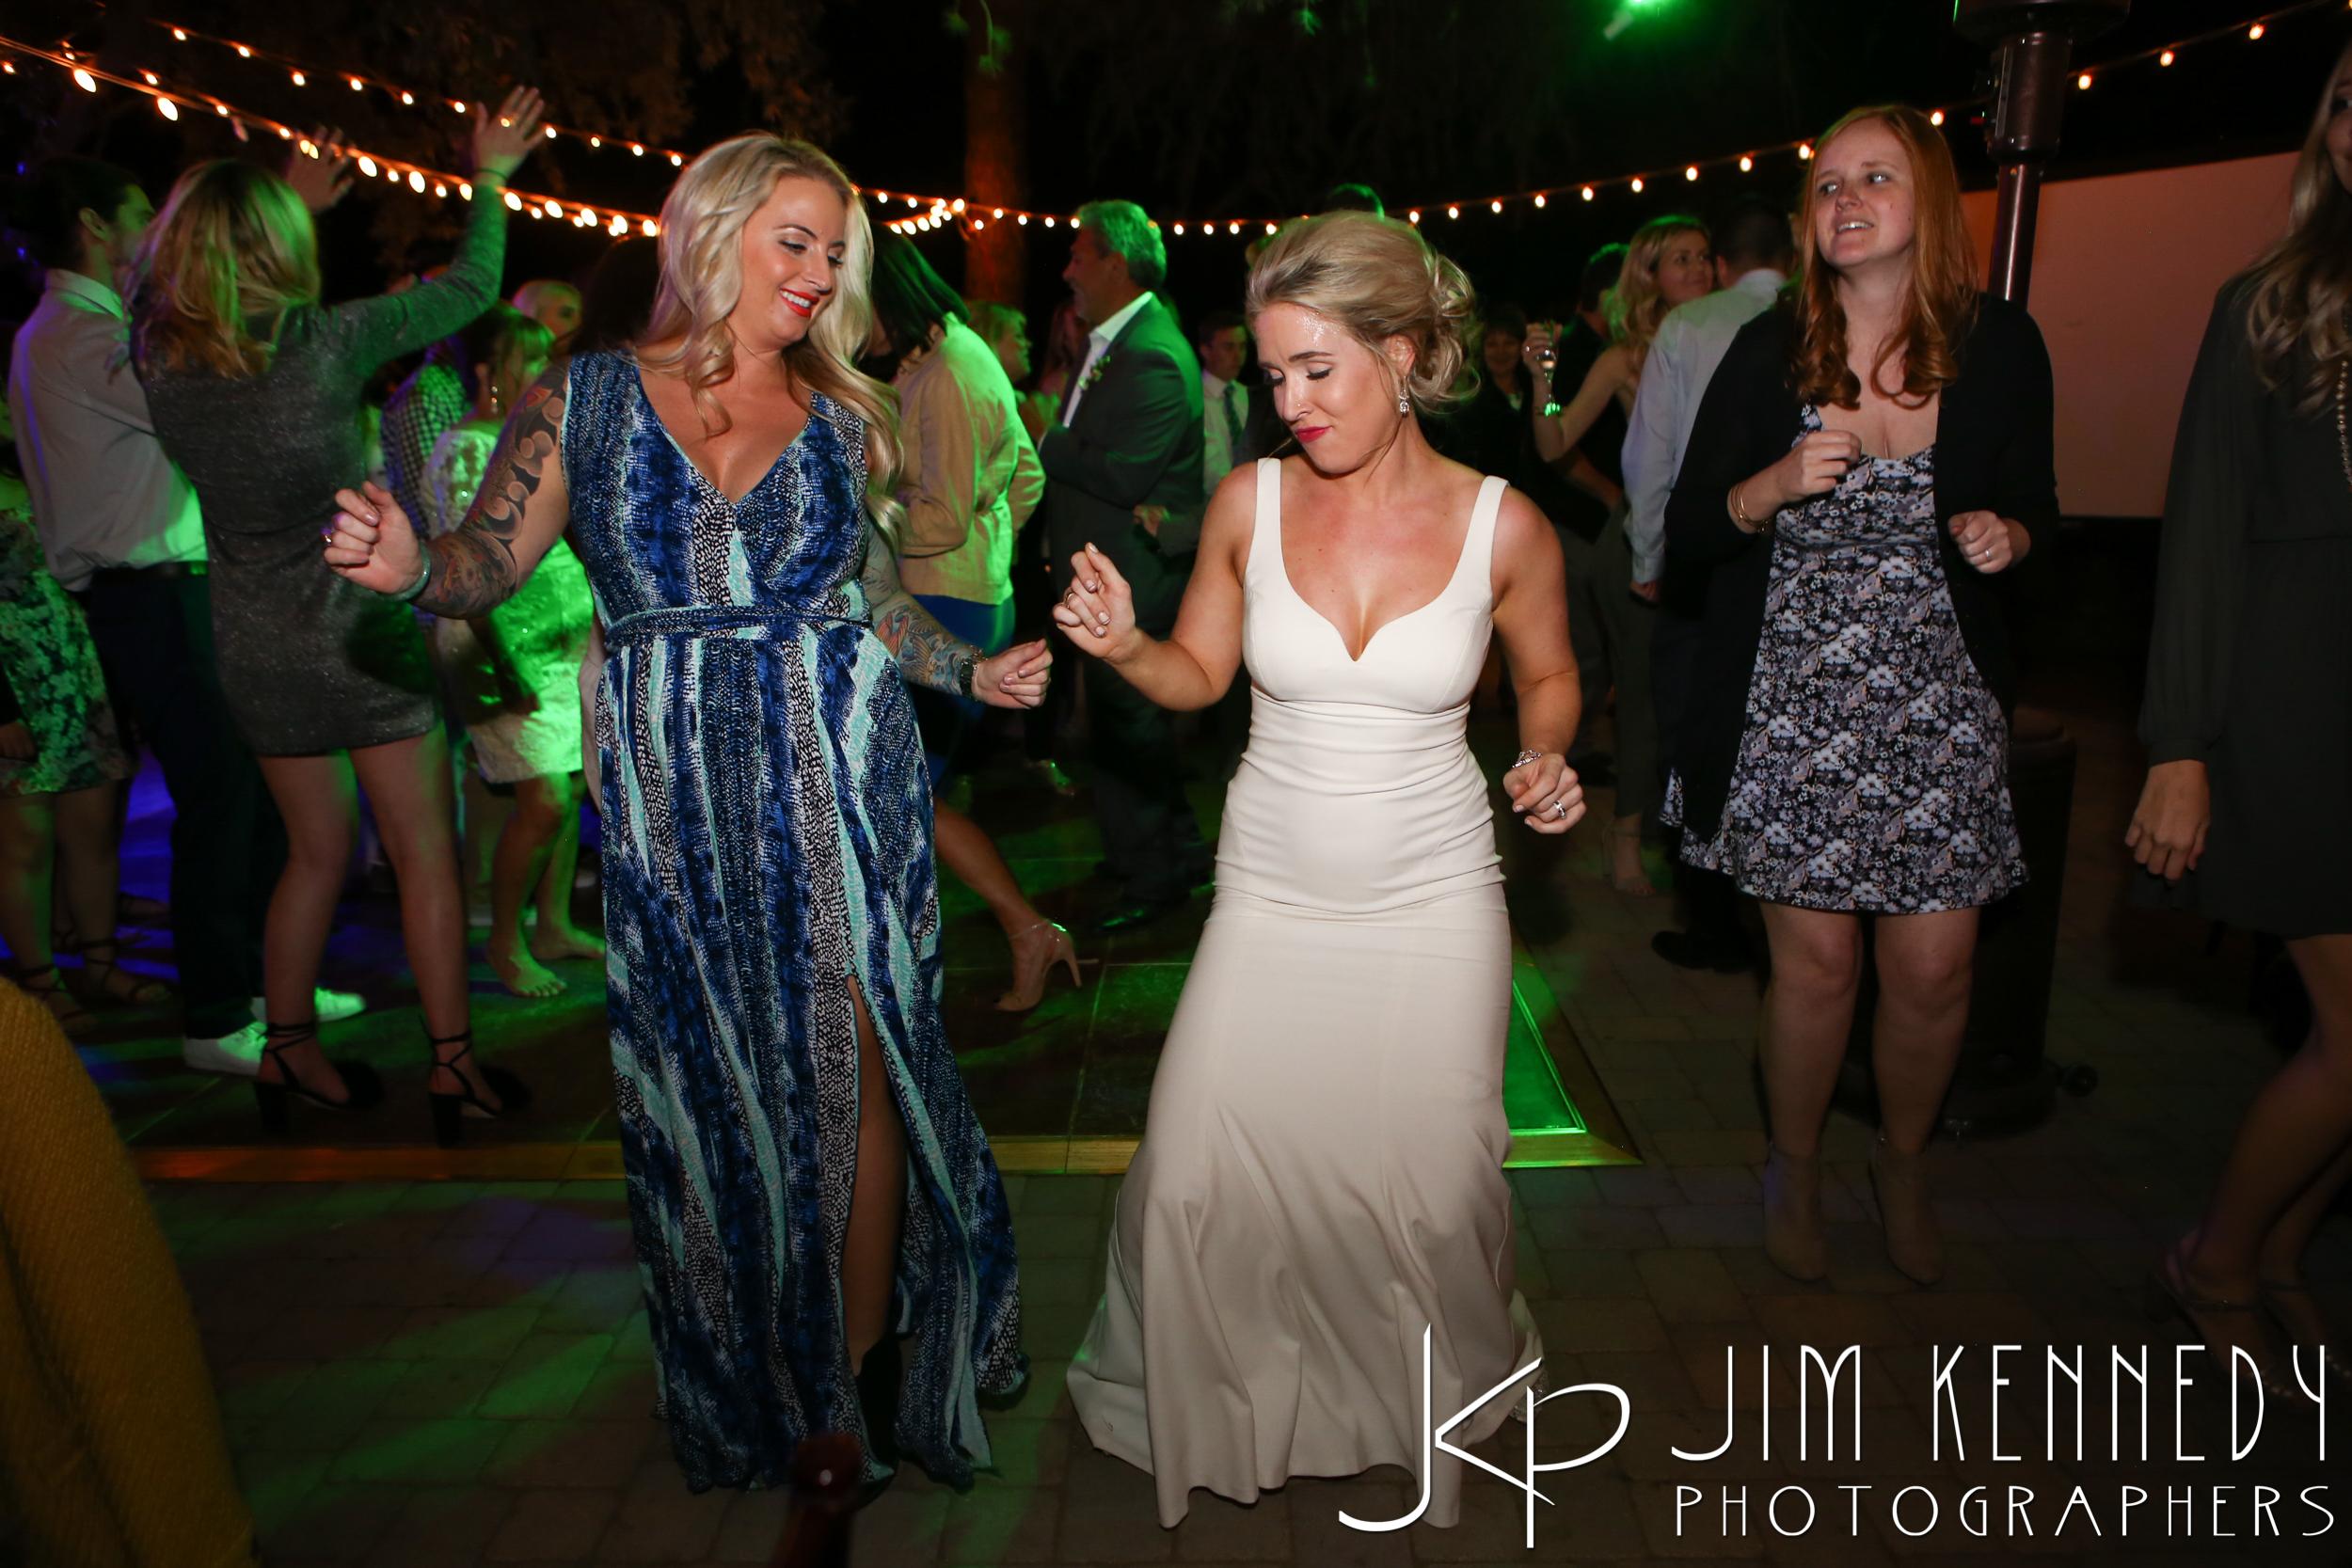 jim_kennedy_photographers_highland_springs_wedding_caitlyn_0205.jpg